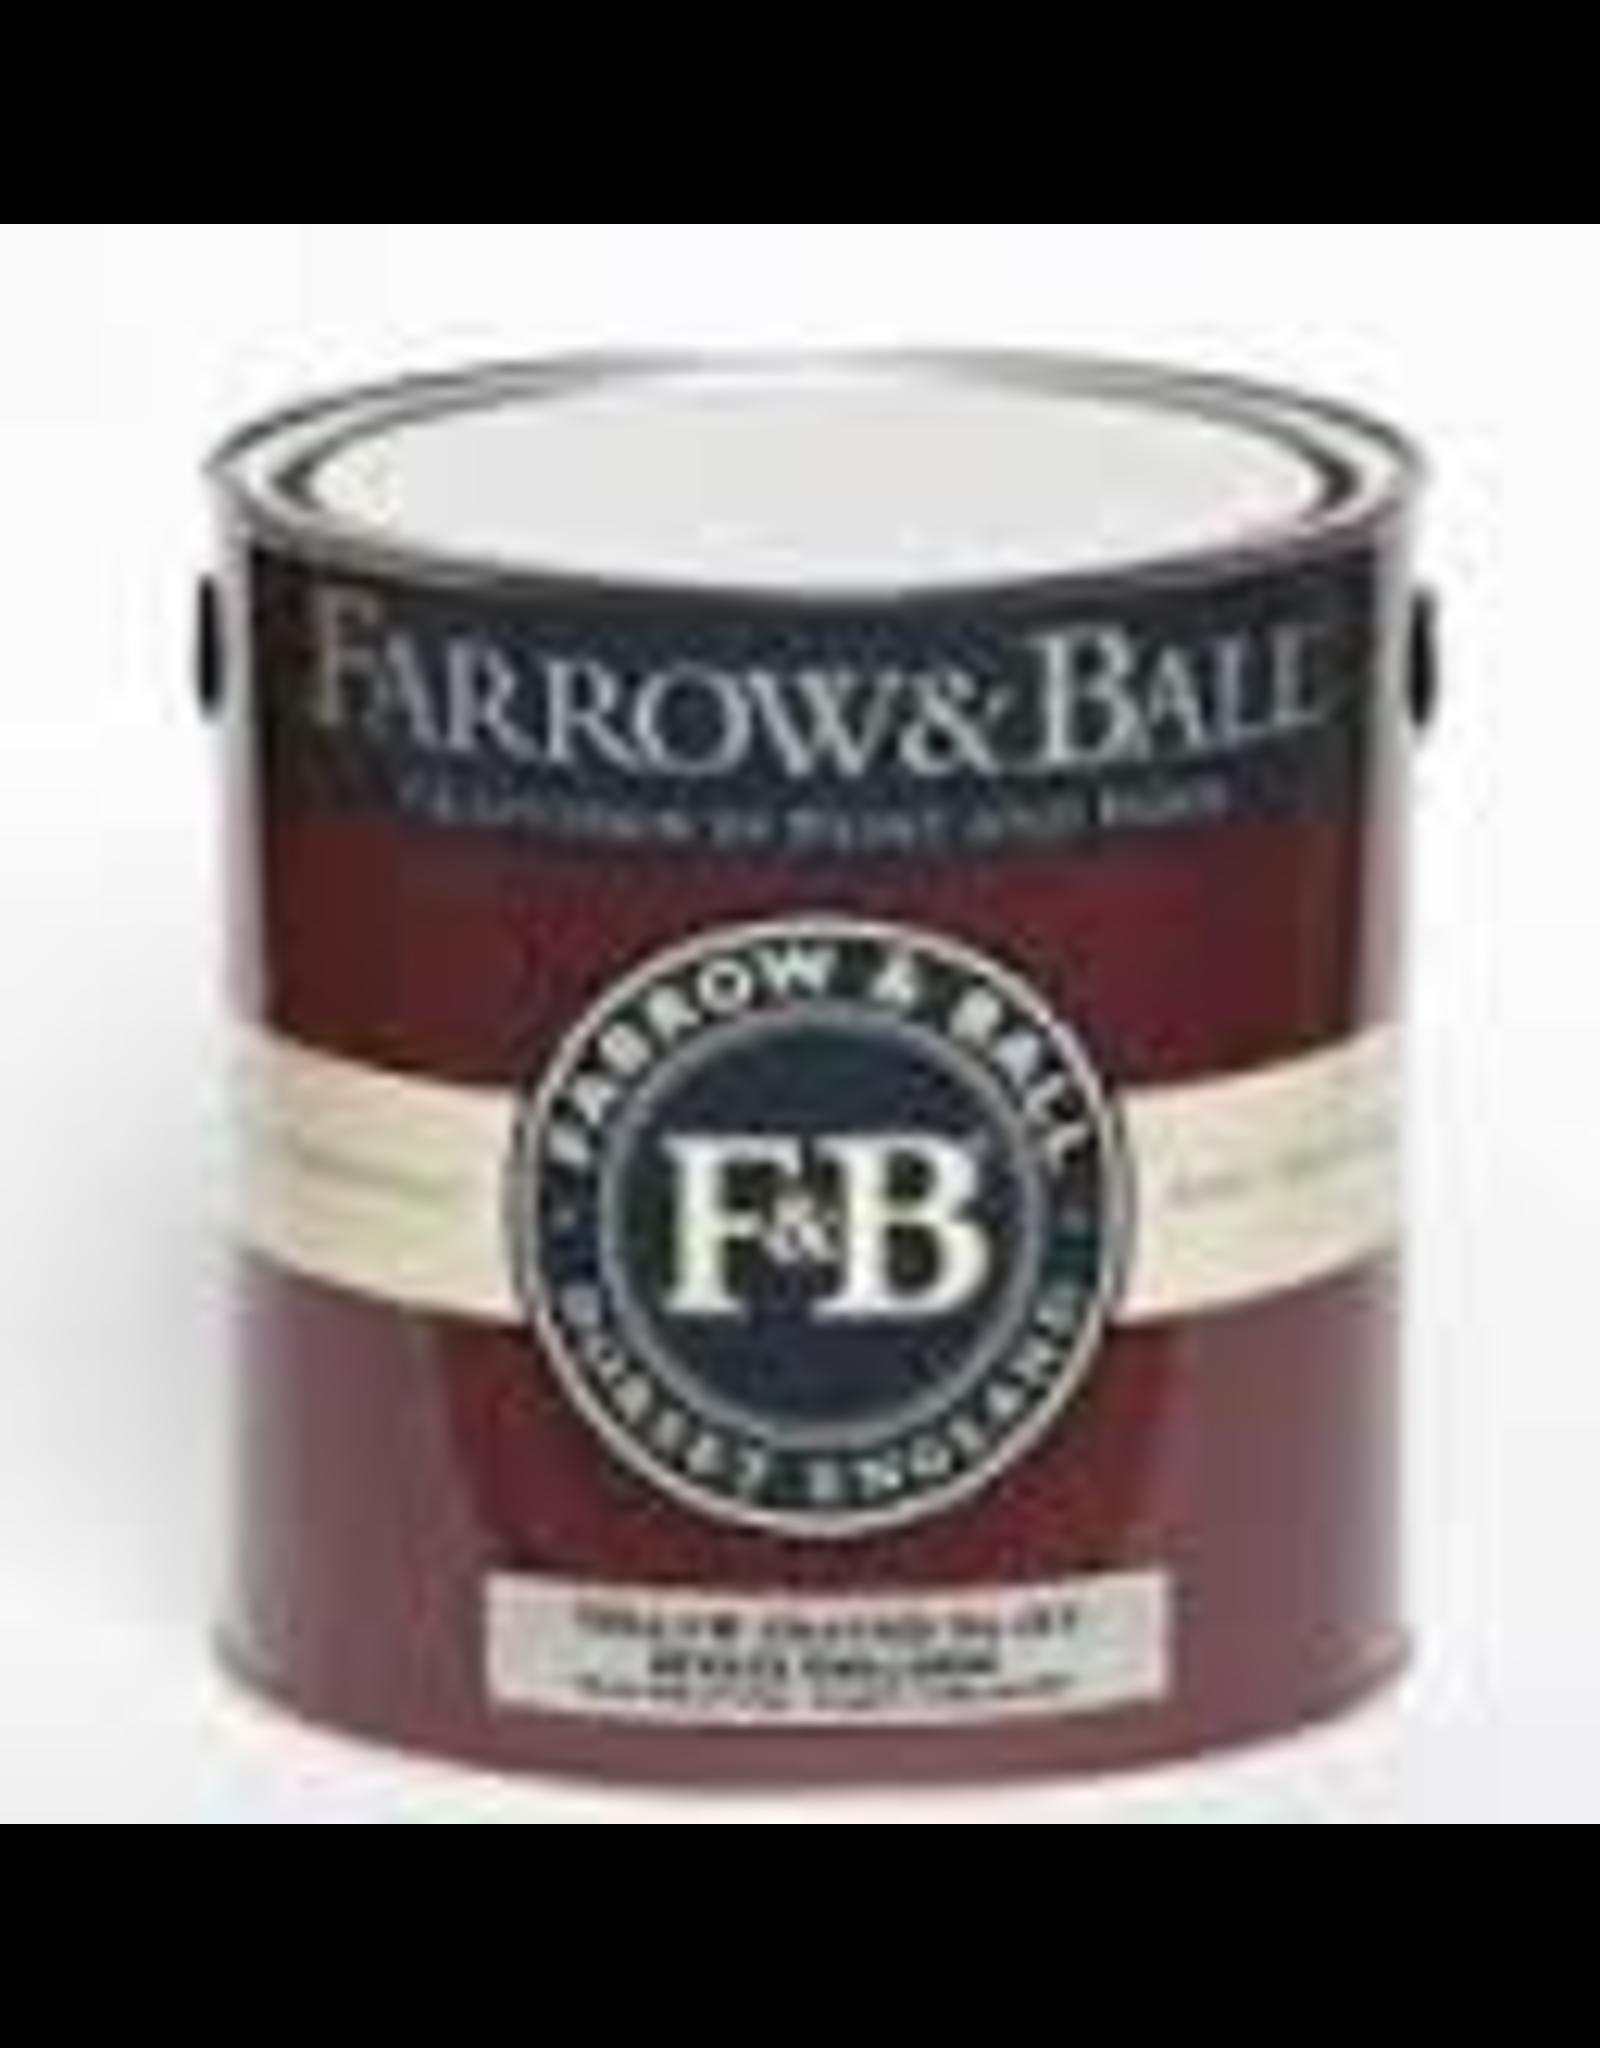 Farrow and Ball Gallon Modern Emulsion Berrington Blue No. 14